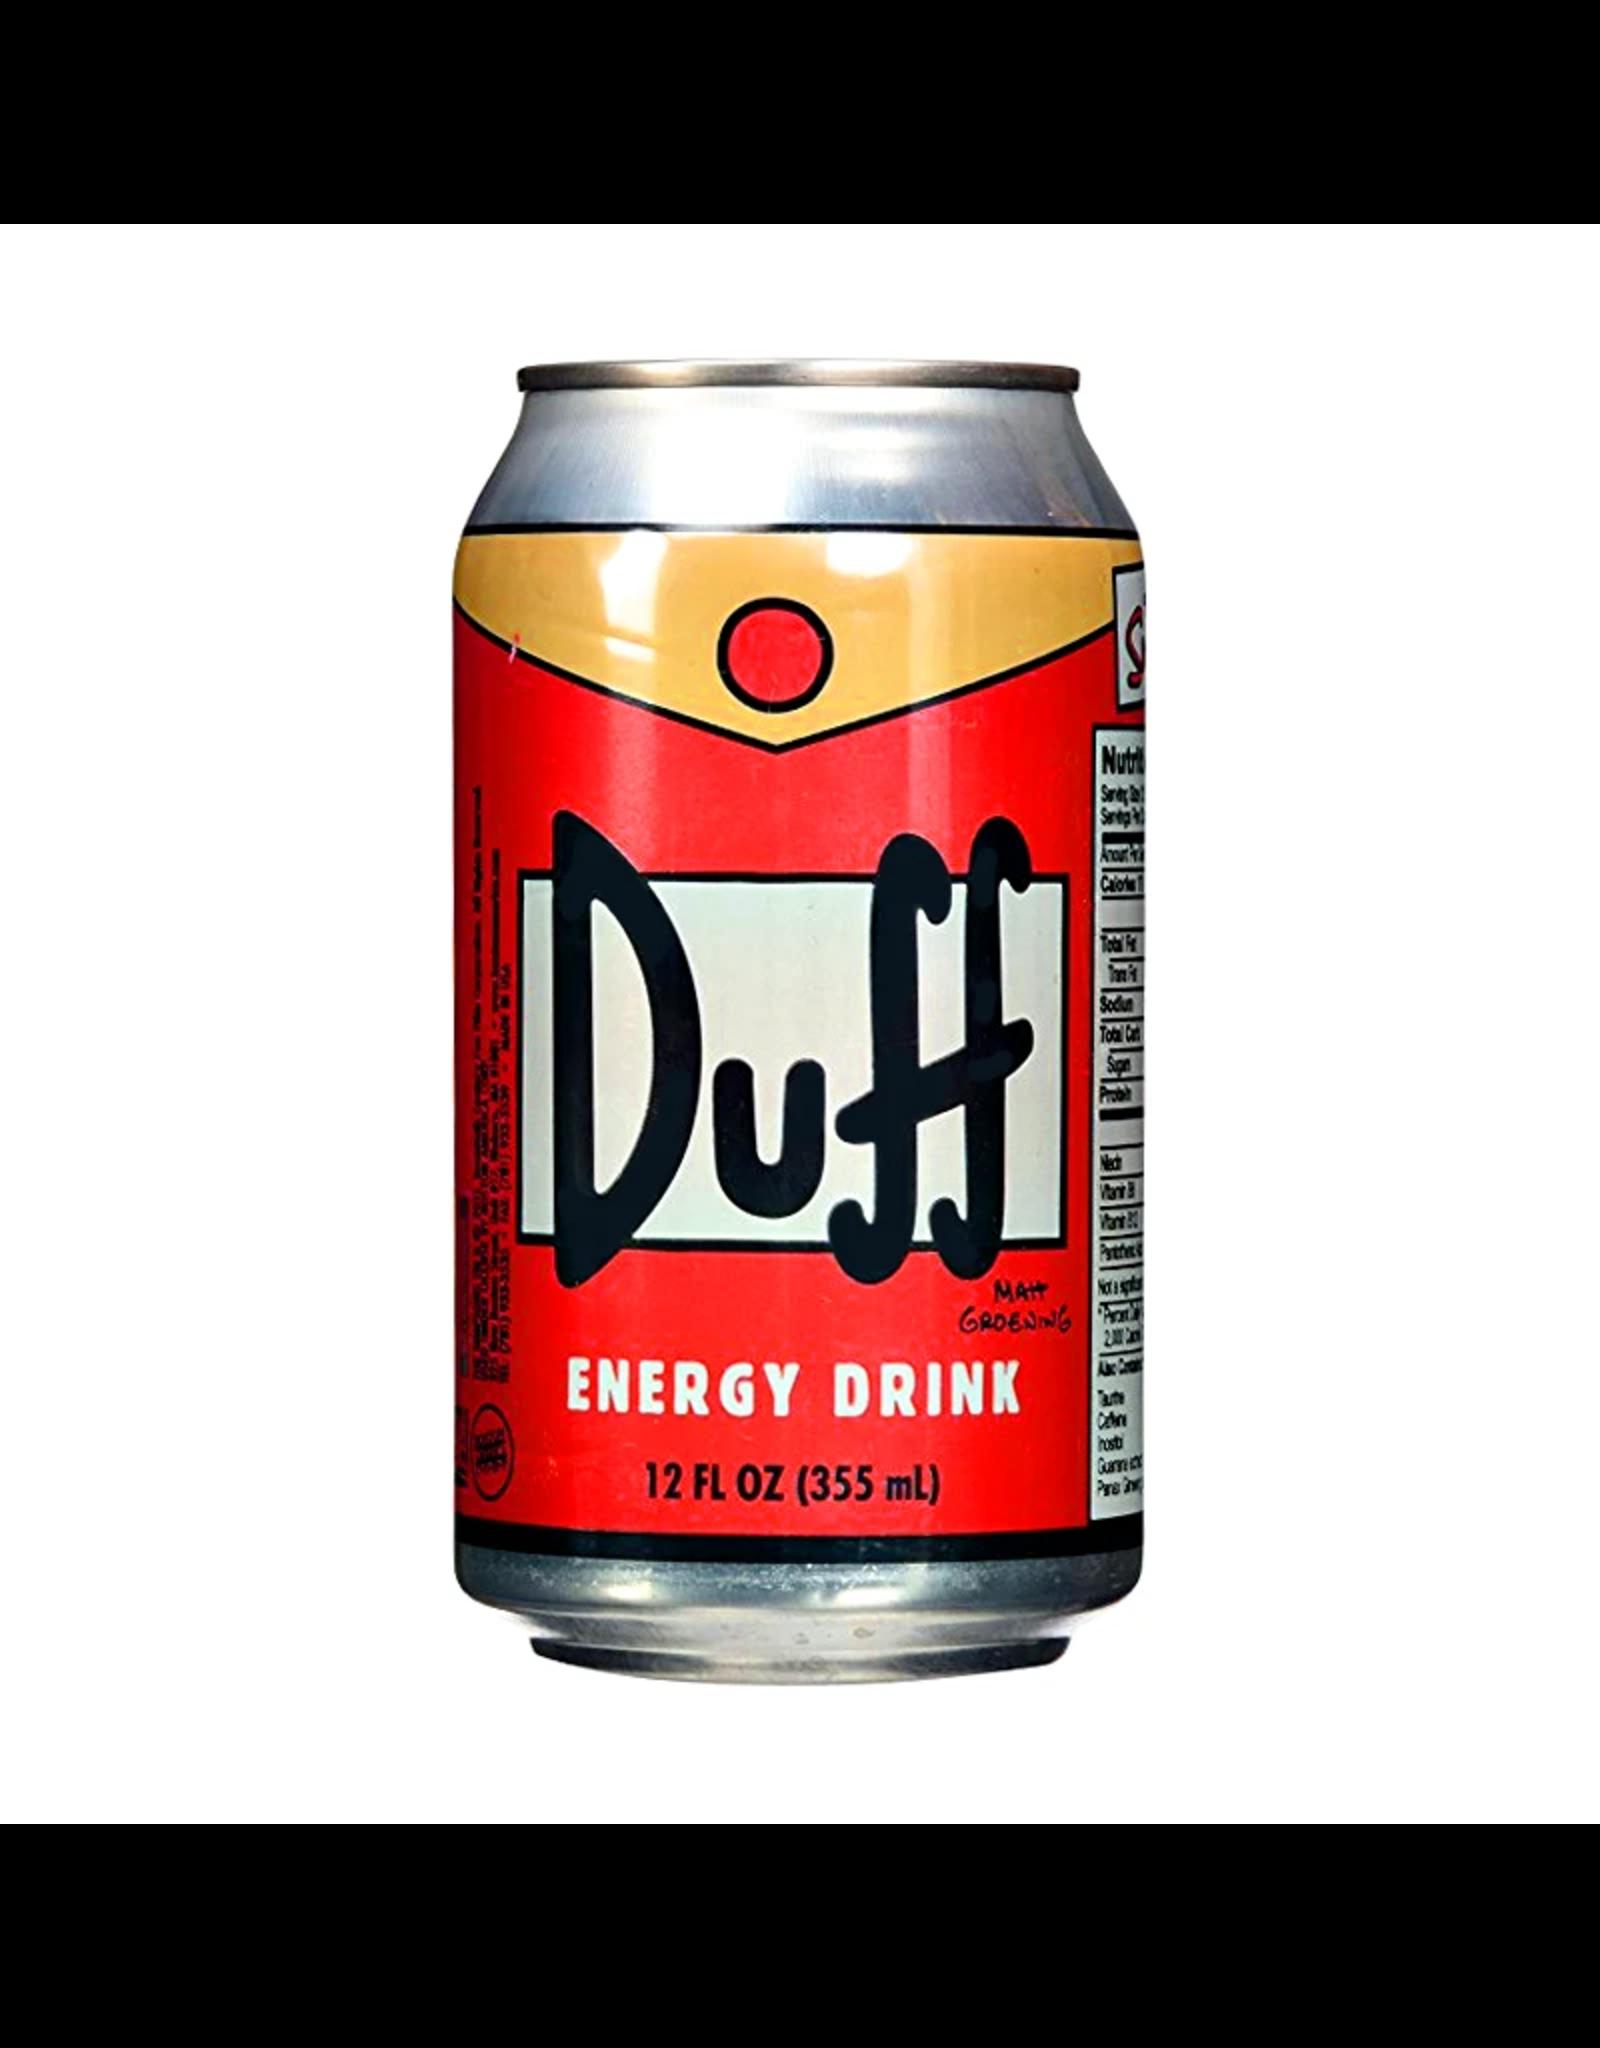 Duff Energy Drink - The Simpsons - 355ml